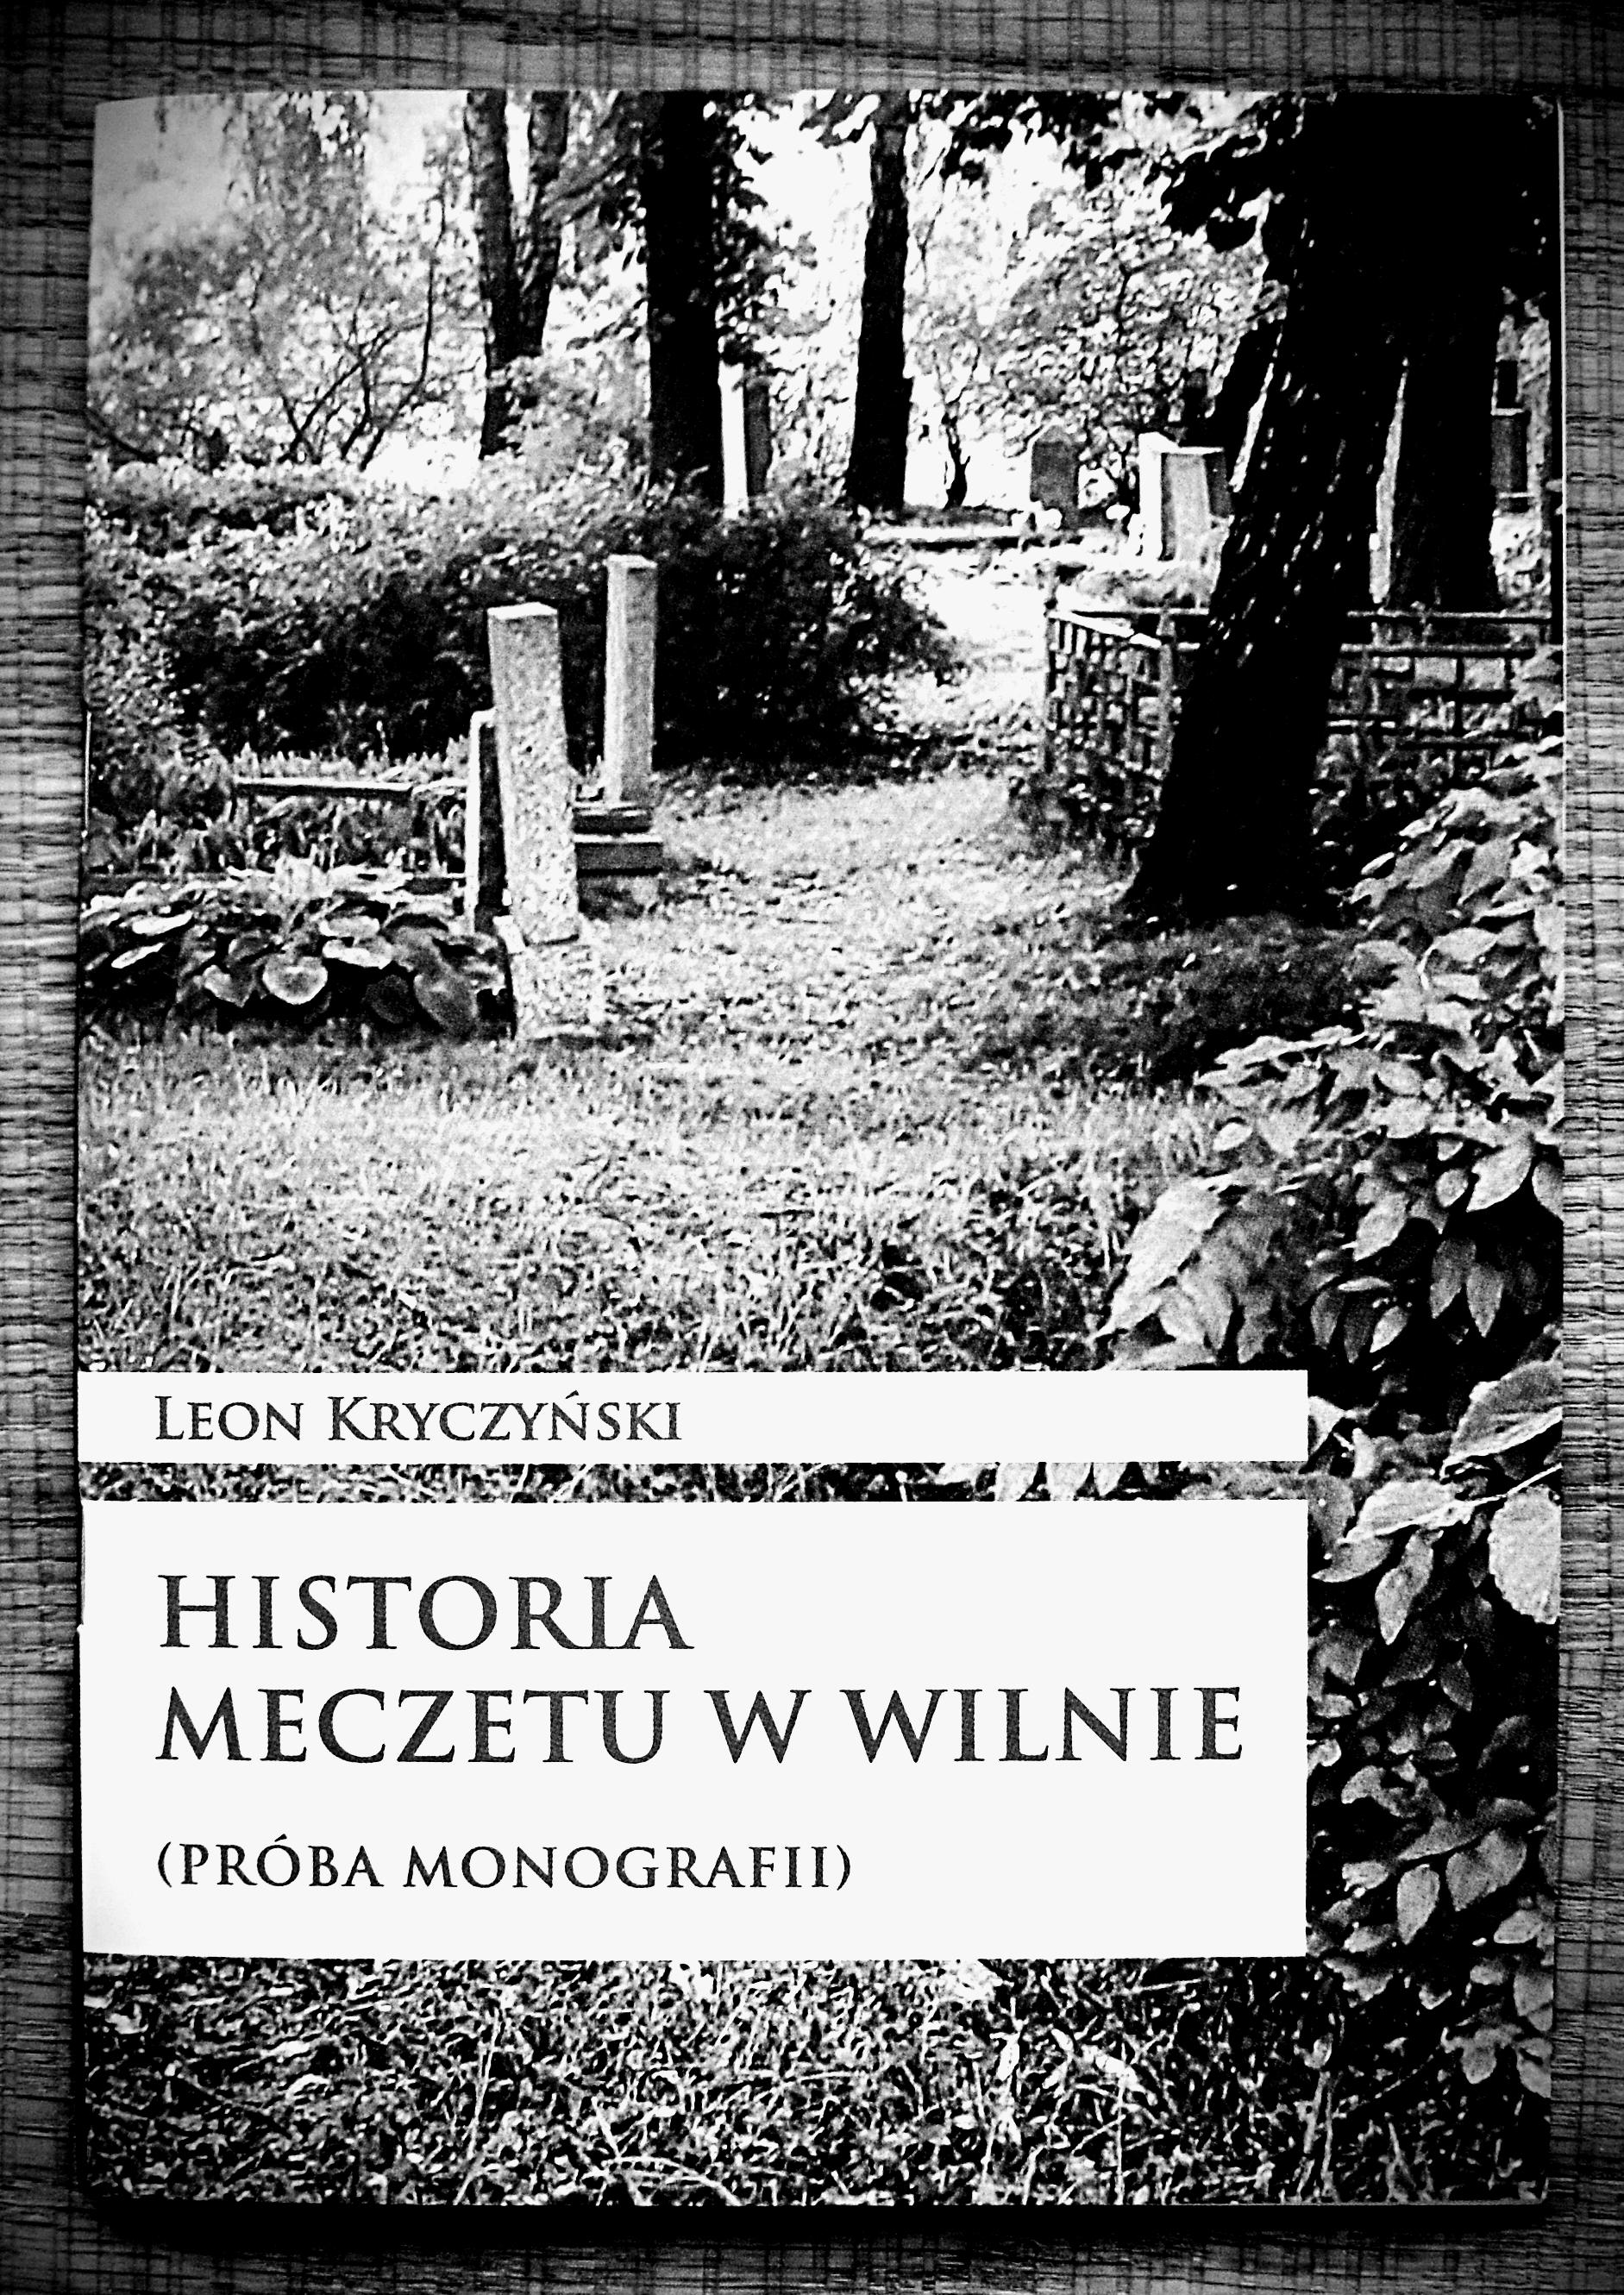 Historia meczetu_cz.b